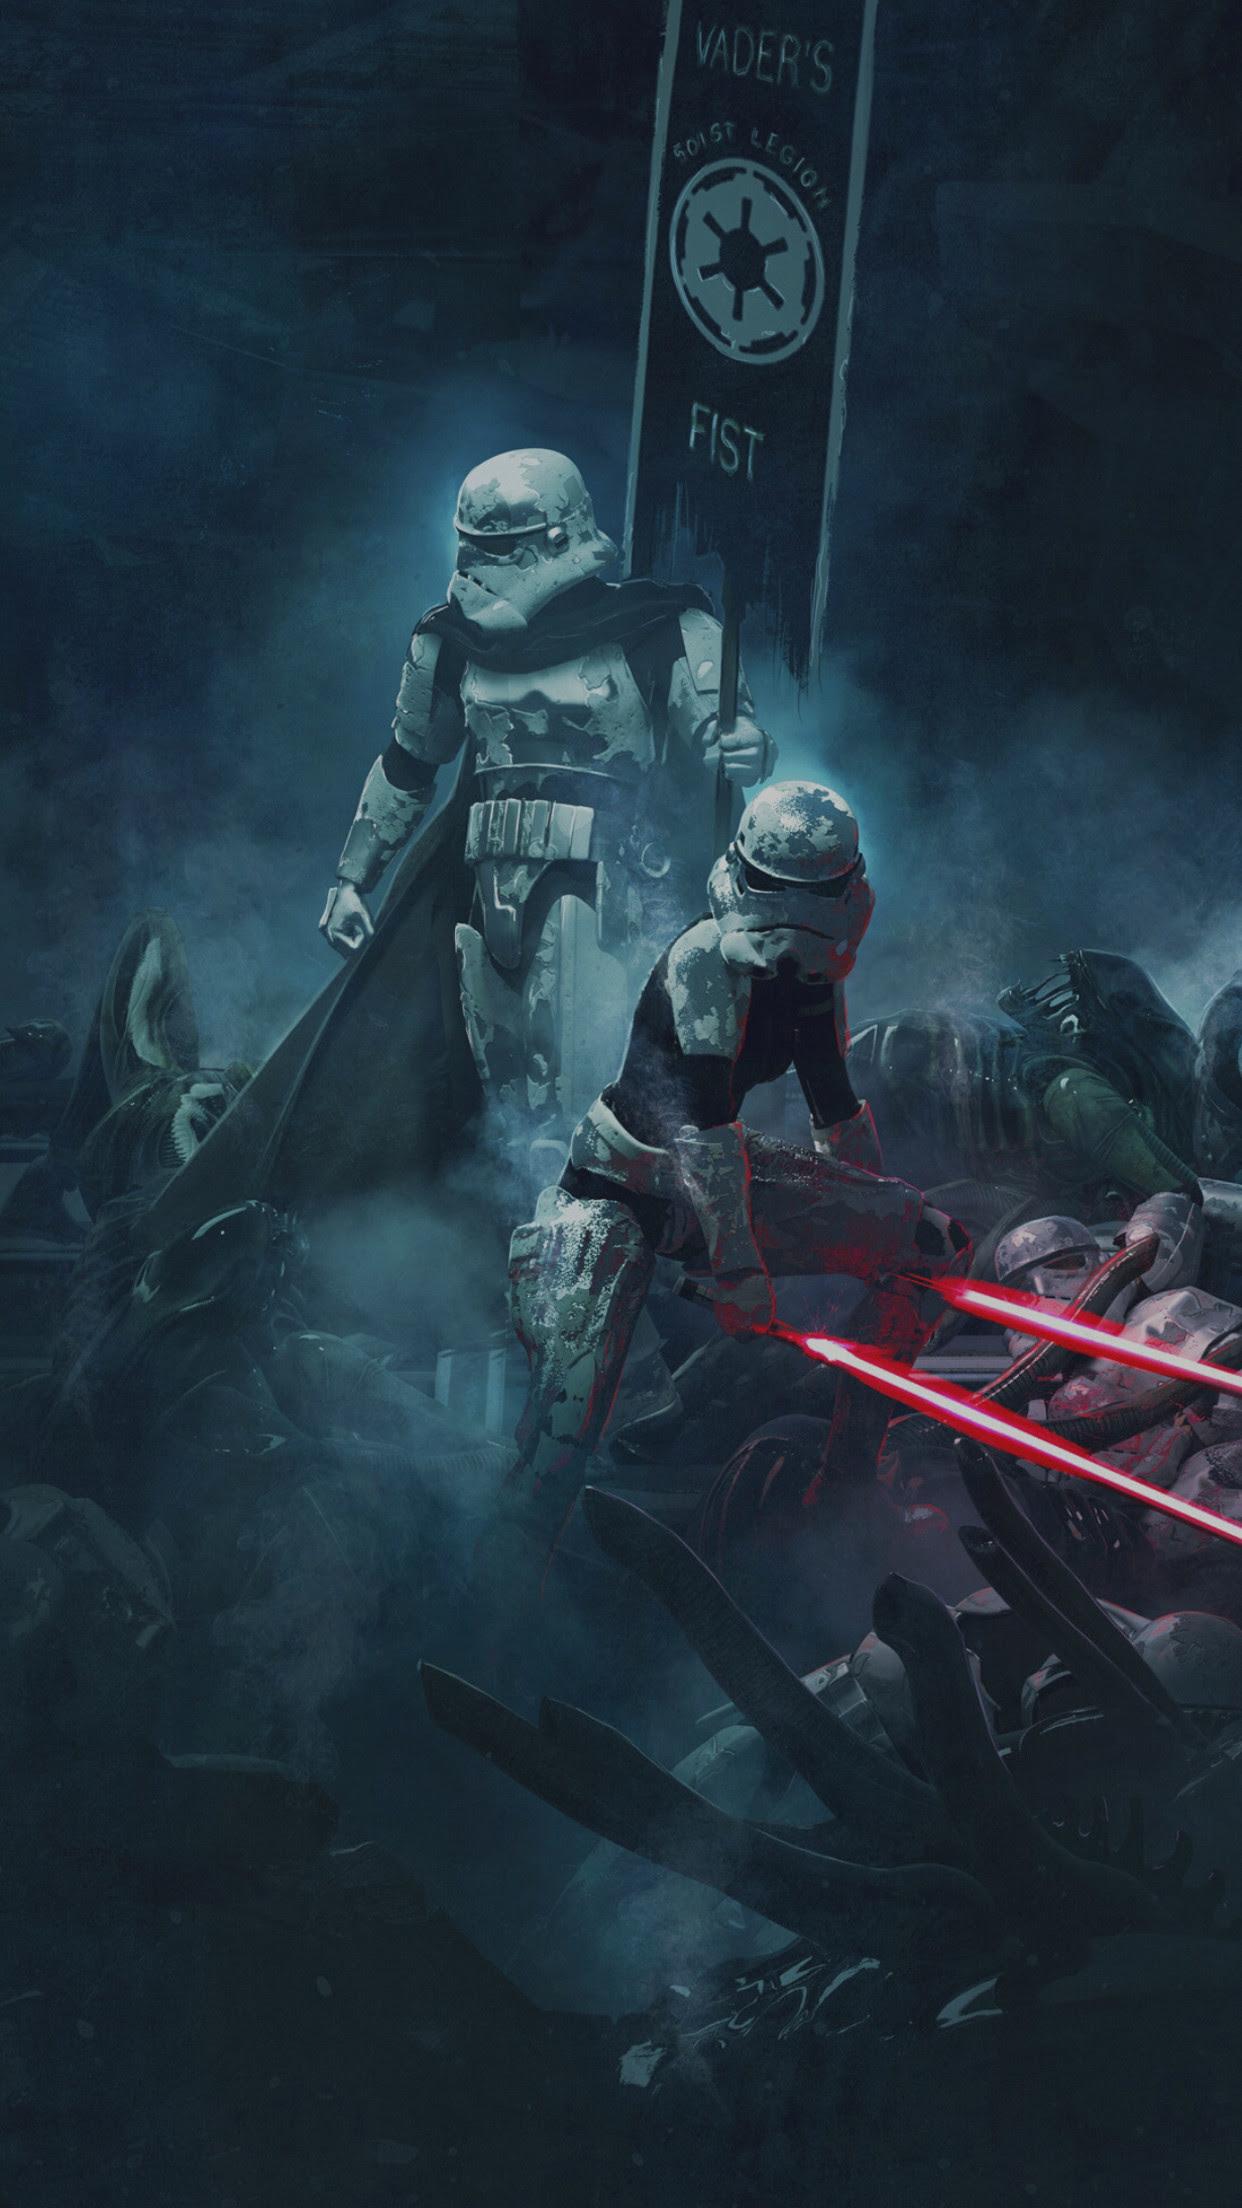 Ultra Hd Star Wars Phone Wallpaper Get Images